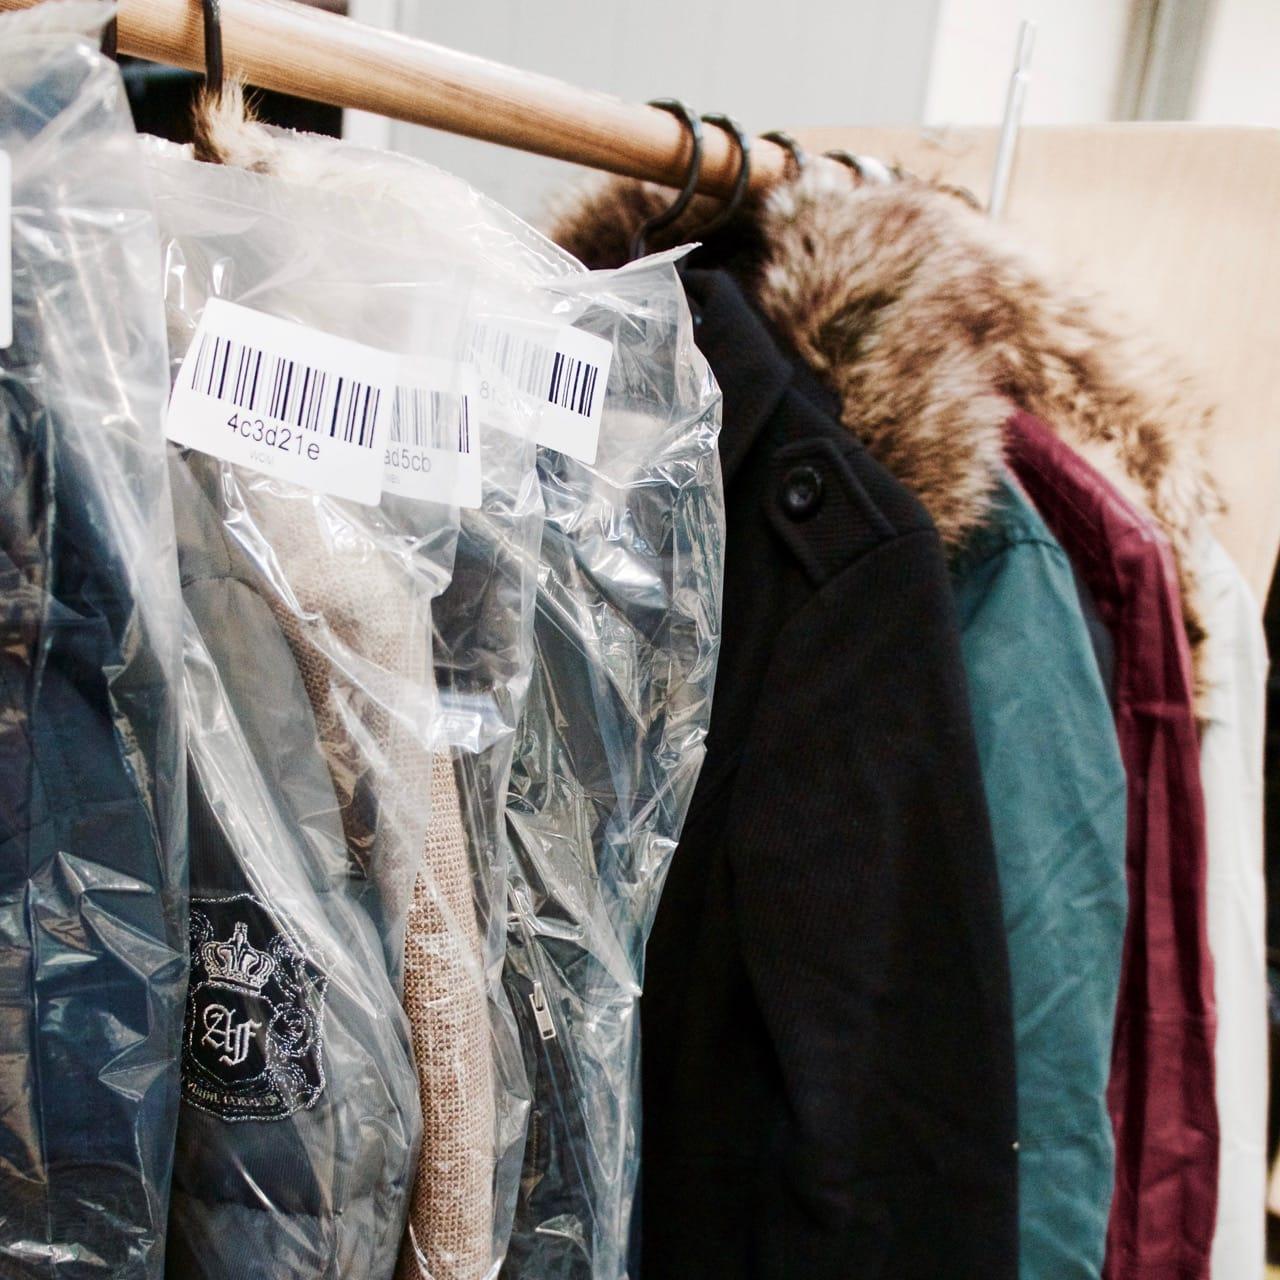 DASISTmomox fashion - Folge mir durch unser Lager 24